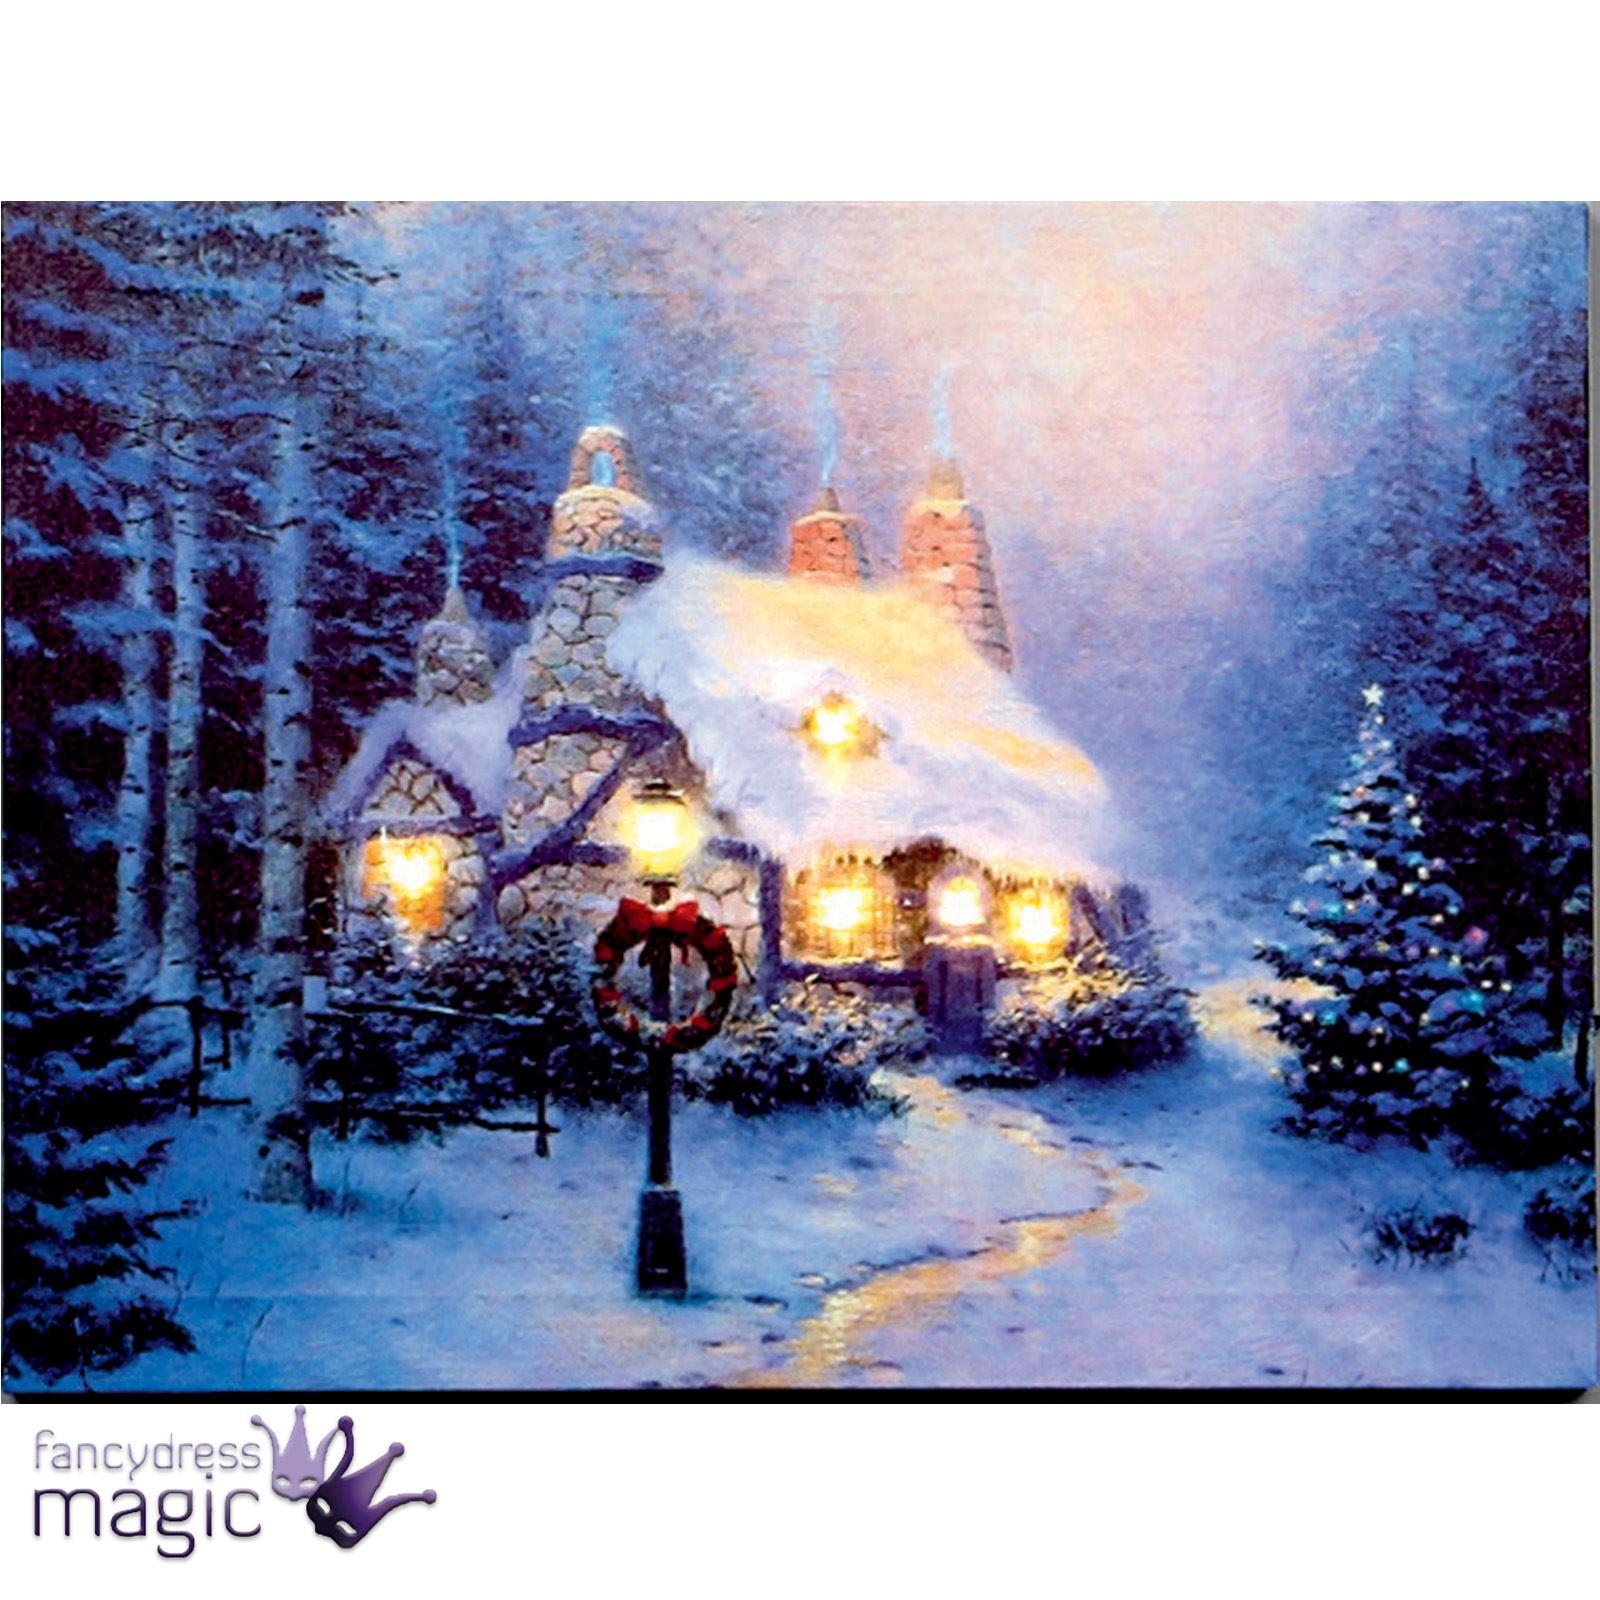 40 x 30cm battery operated led christmas xmas canvas print for Christmas wall art amazon